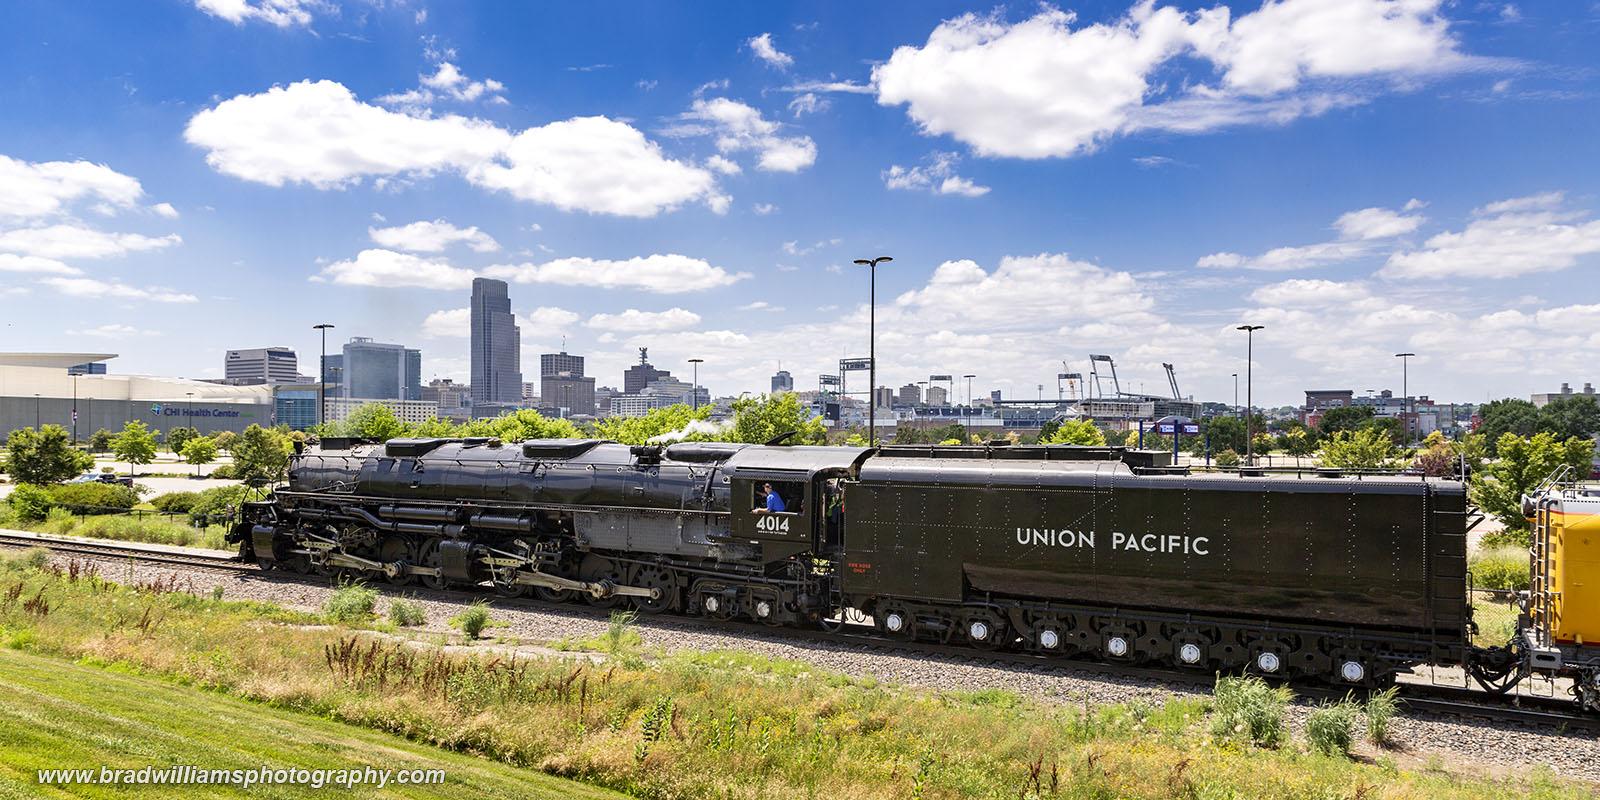 BigBoy, Union Pacific, Steam, Locomotive, Railroad, Train, History, Nebraska, Omaha, photo